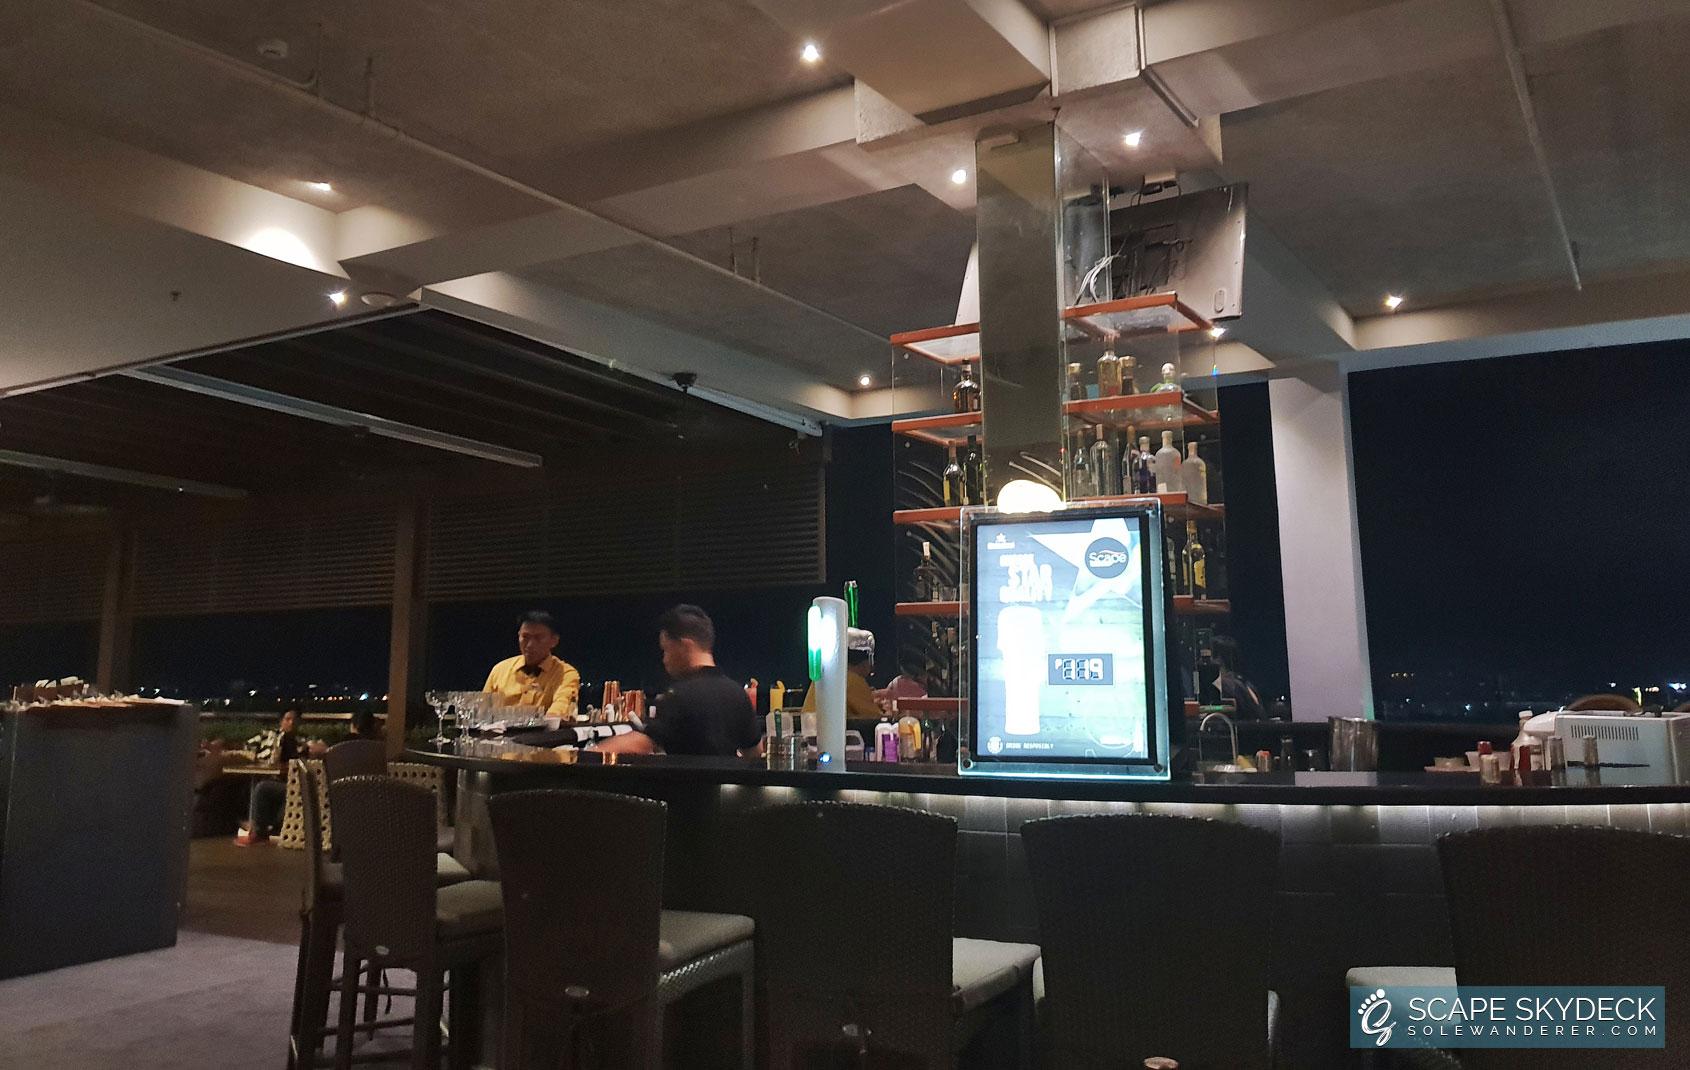 Scape Skydeck Bar